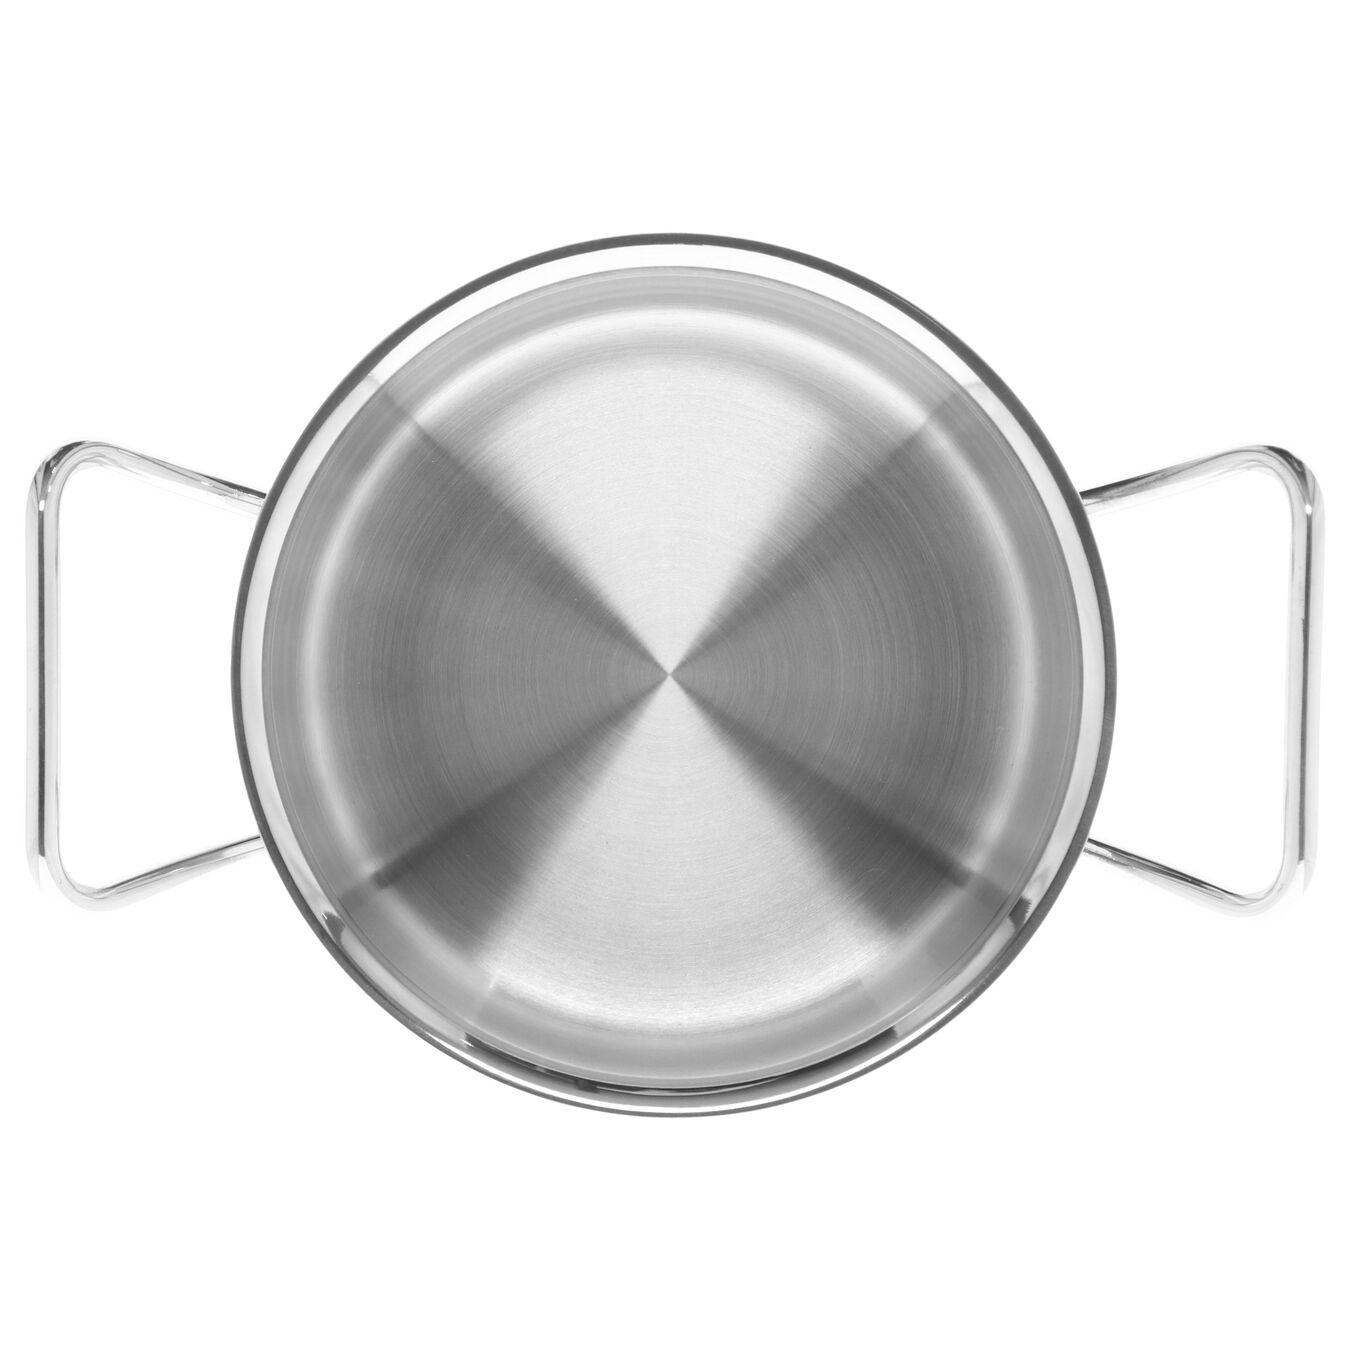 Kookpan met glazen deksel 24 cm / 5 l,,large 5